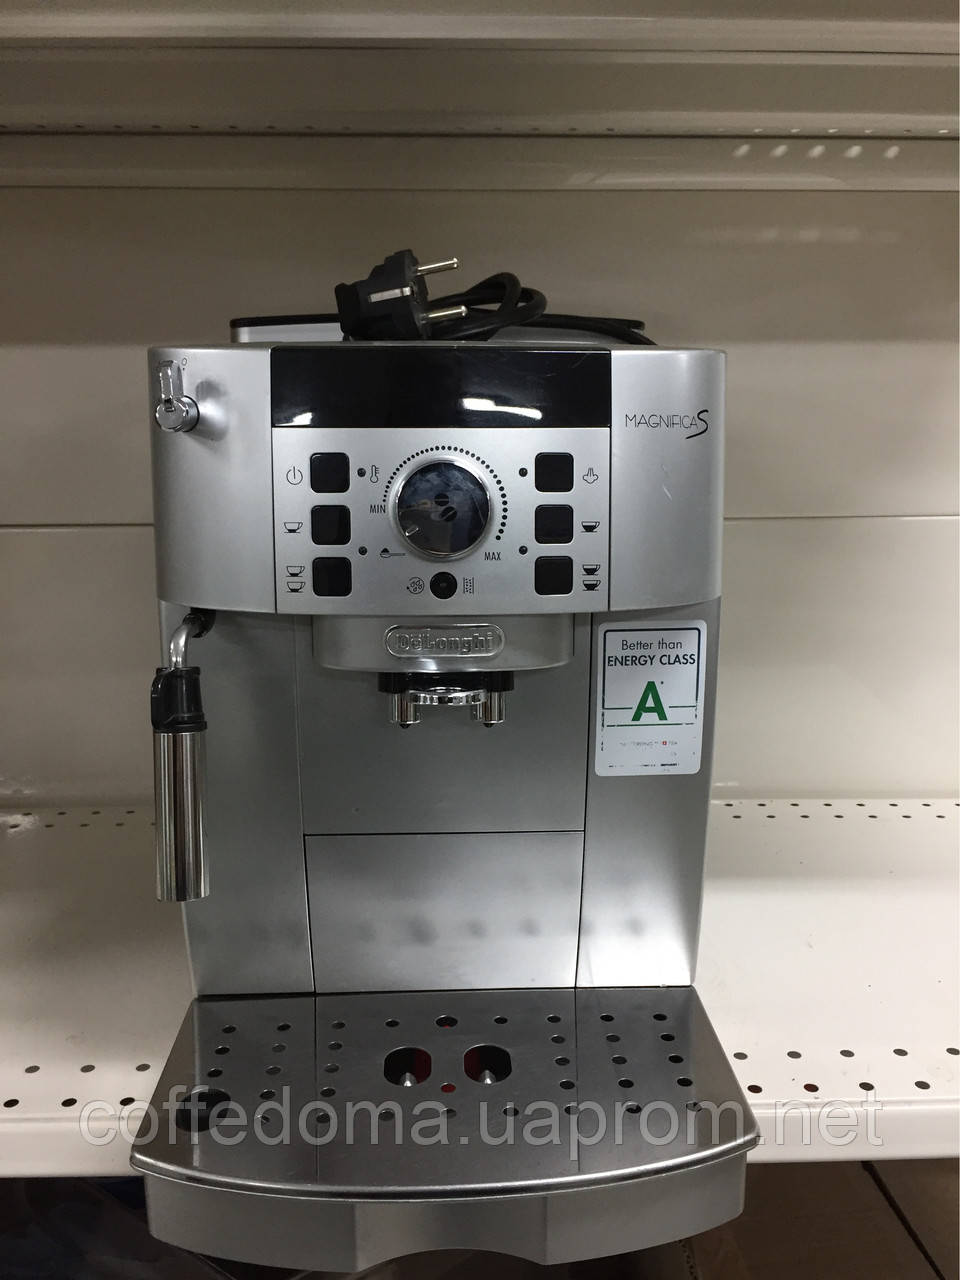 Delonghi ecam 22.110 SB автоматическая кофемашина, фото 1